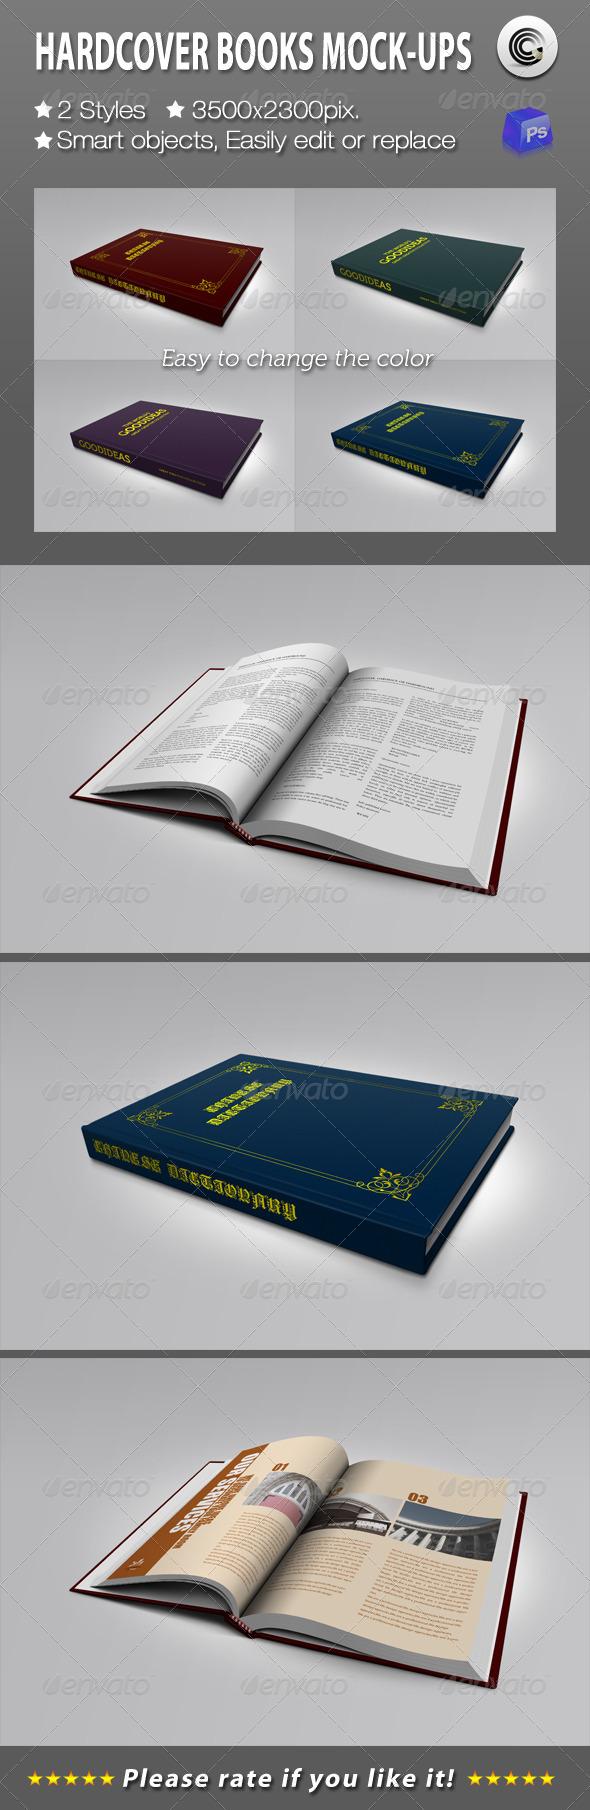 Hardcover Books Mock-ups